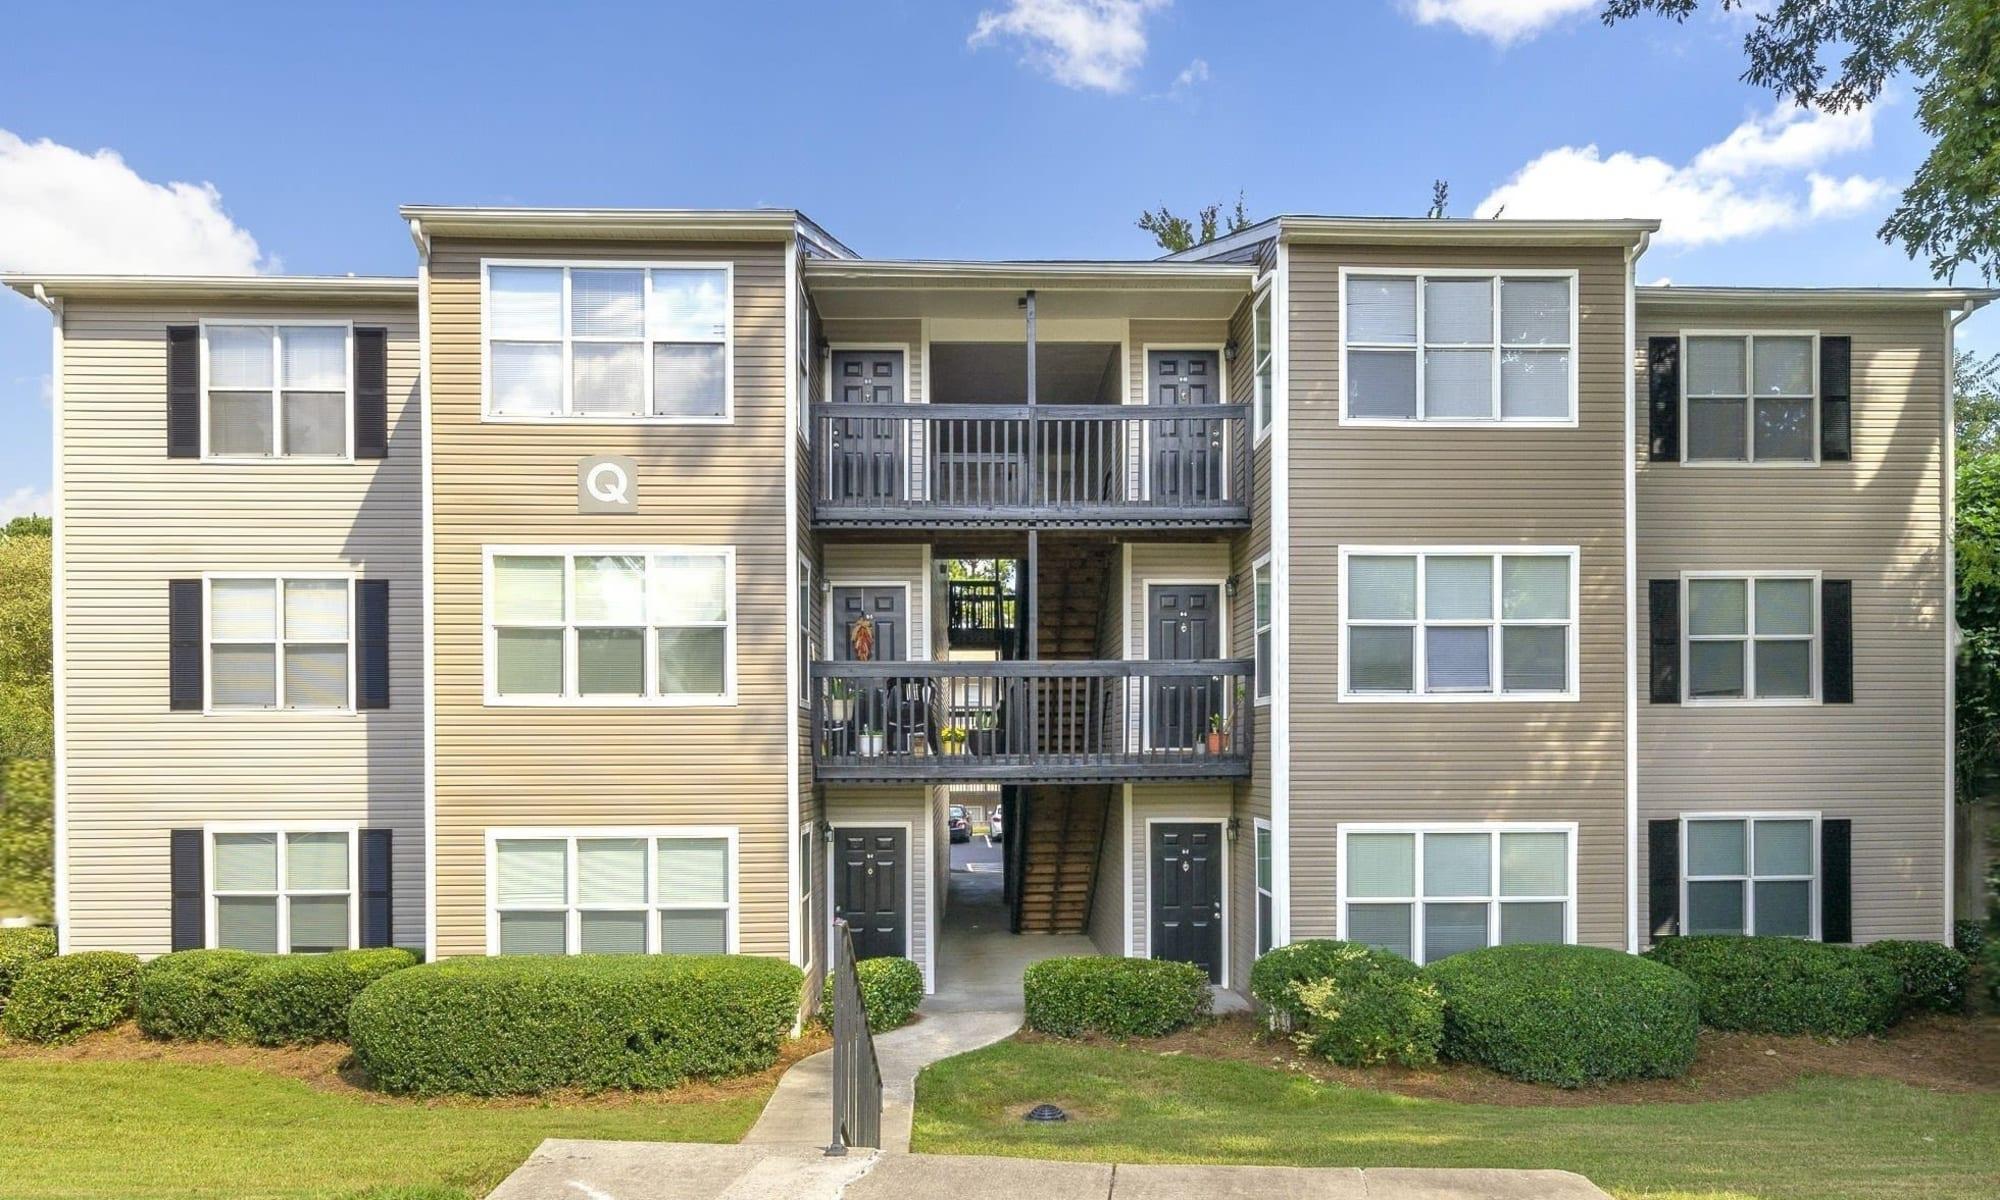 Exterior image of The Greens at Cascade Apartment Homes in Atlanta,GA